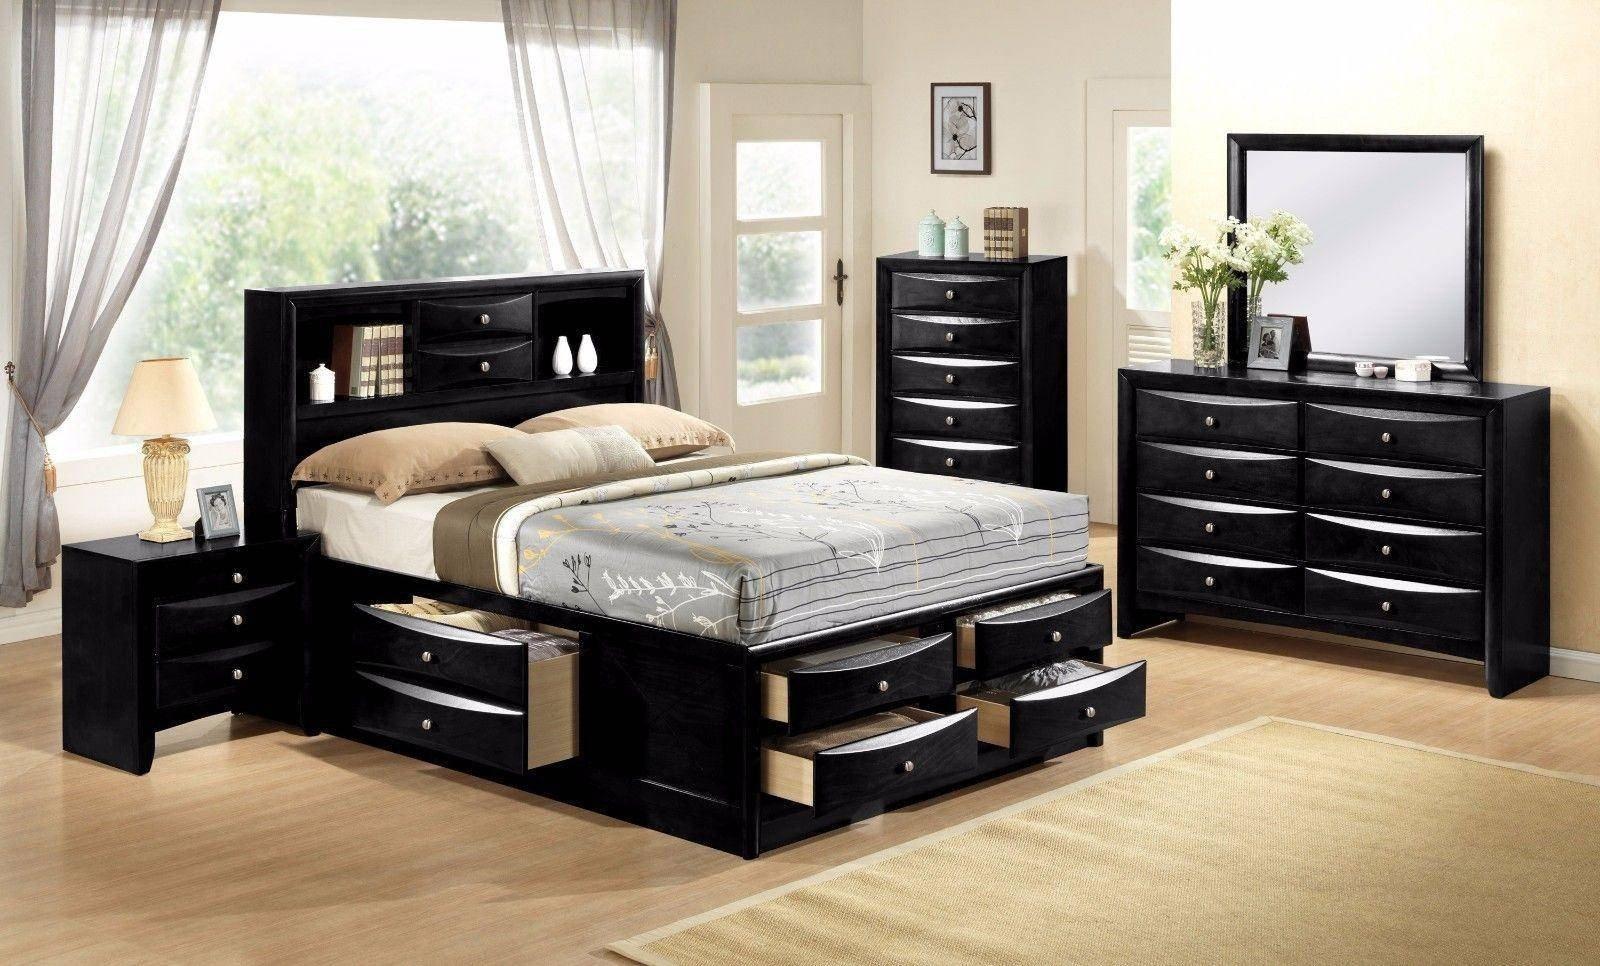 How to organize A Bedroom Fresh Crown Mark B4285 Emily Modern Black Finish Storage King Size